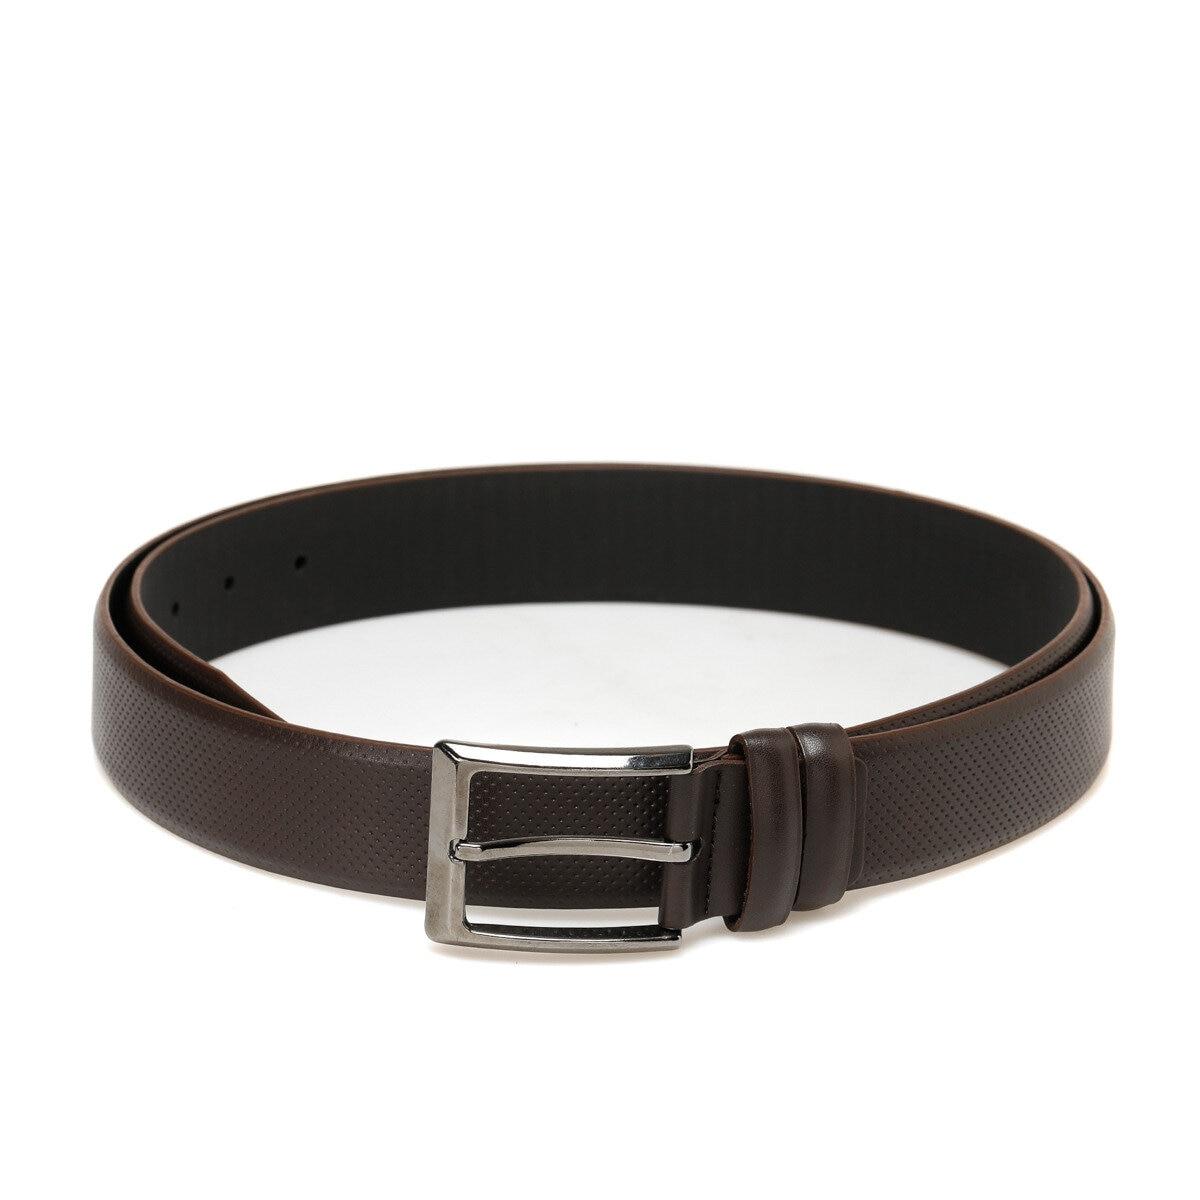 FLO 20M RS IGNE BSKL-03 Brown Men 'S Belt Garamond